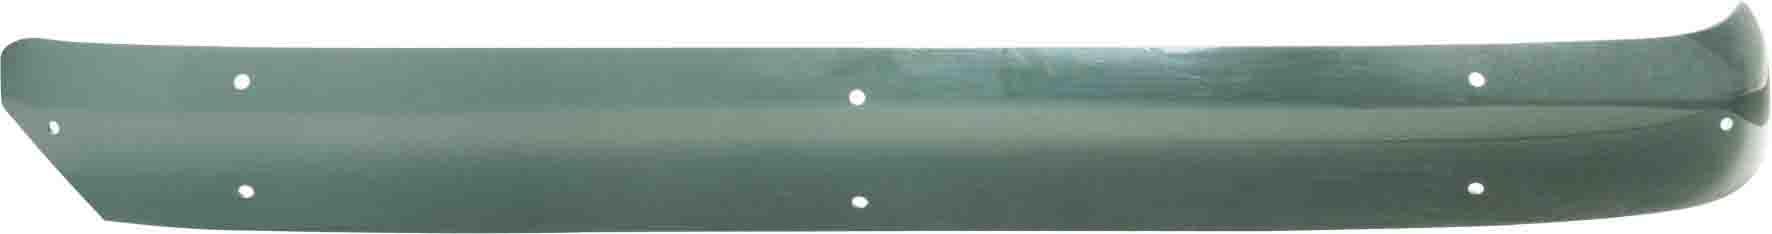 MERCEDES SUN VISOR NEW ARC-EXP.304230 9738111010